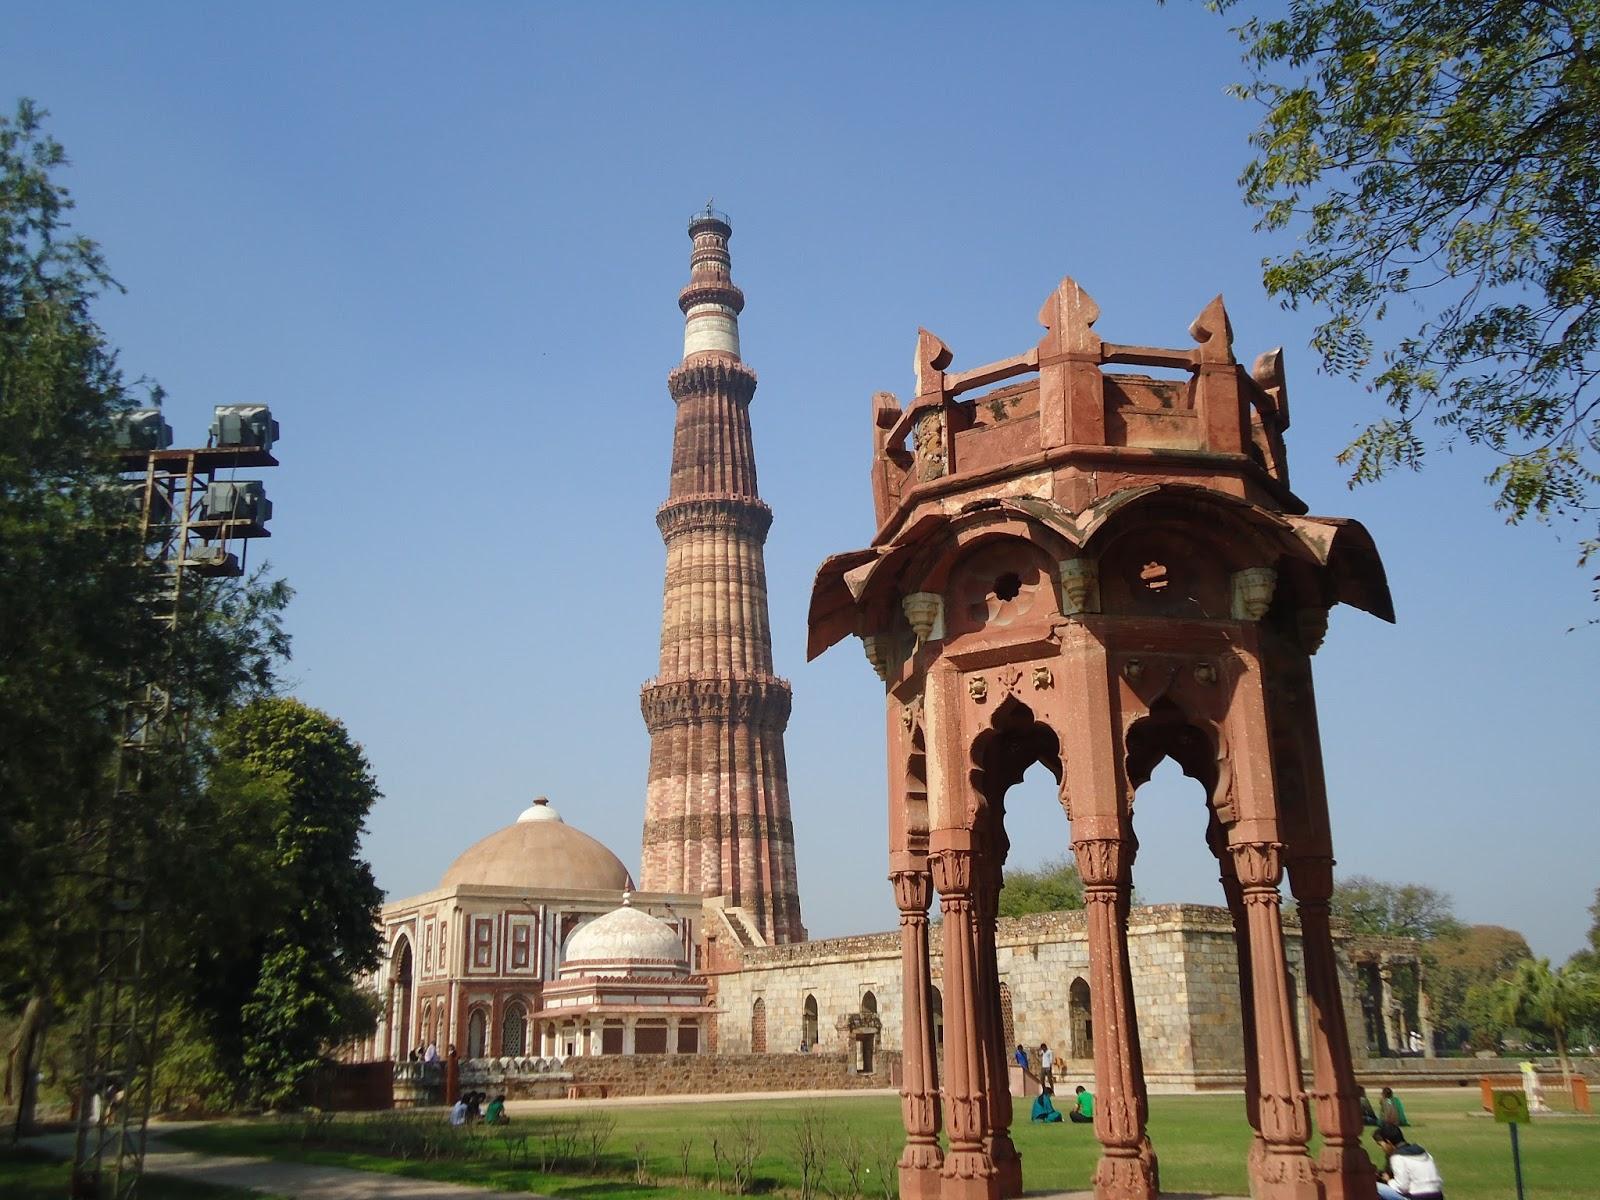 Delhi Heritage Smith S Folly On Top Of Qutub Minar